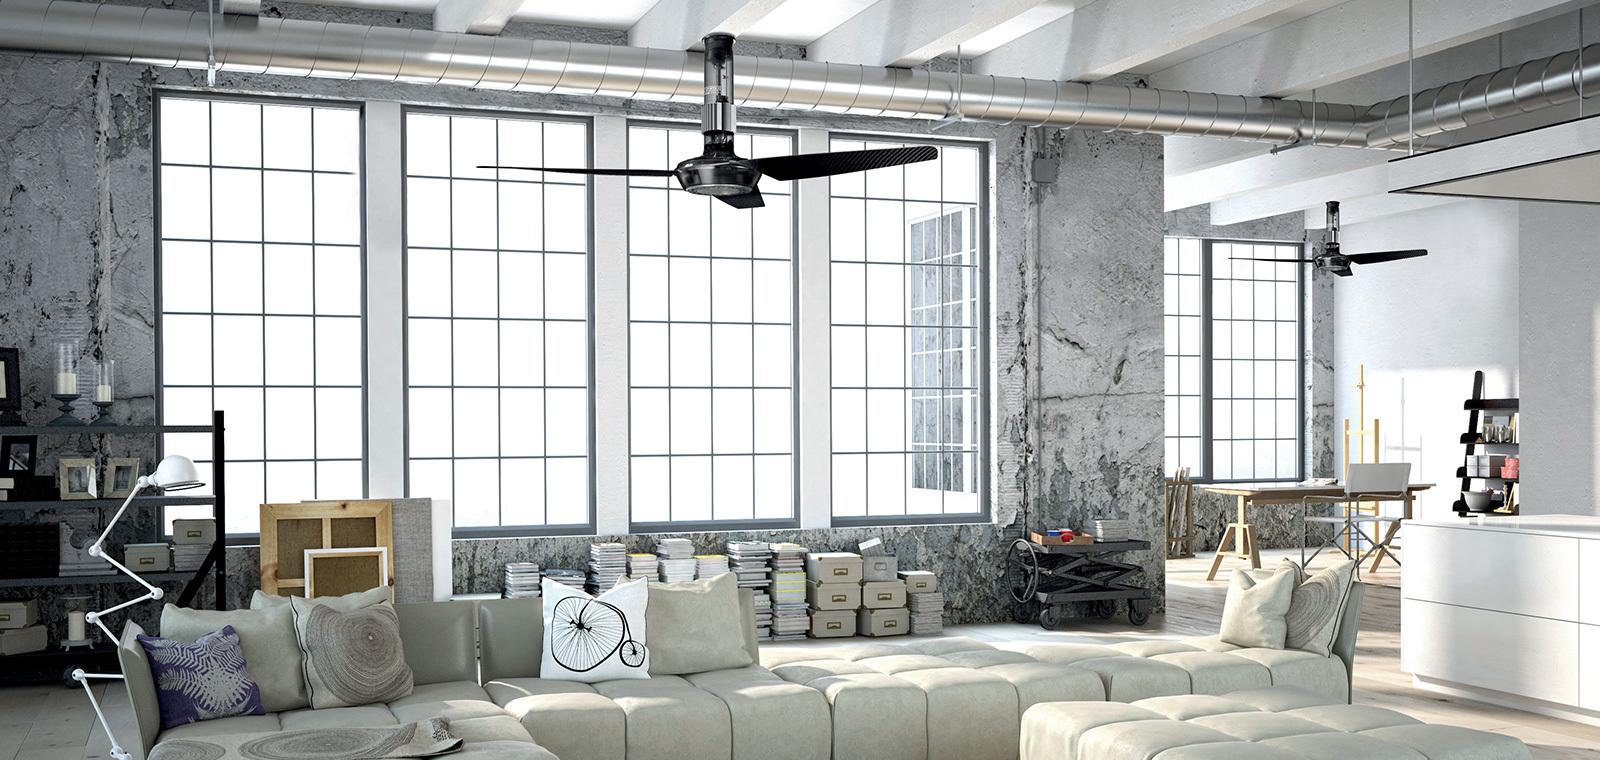 Nordik Air Design MOMO Design 180 cm (Dto. 30% incluido) 00070